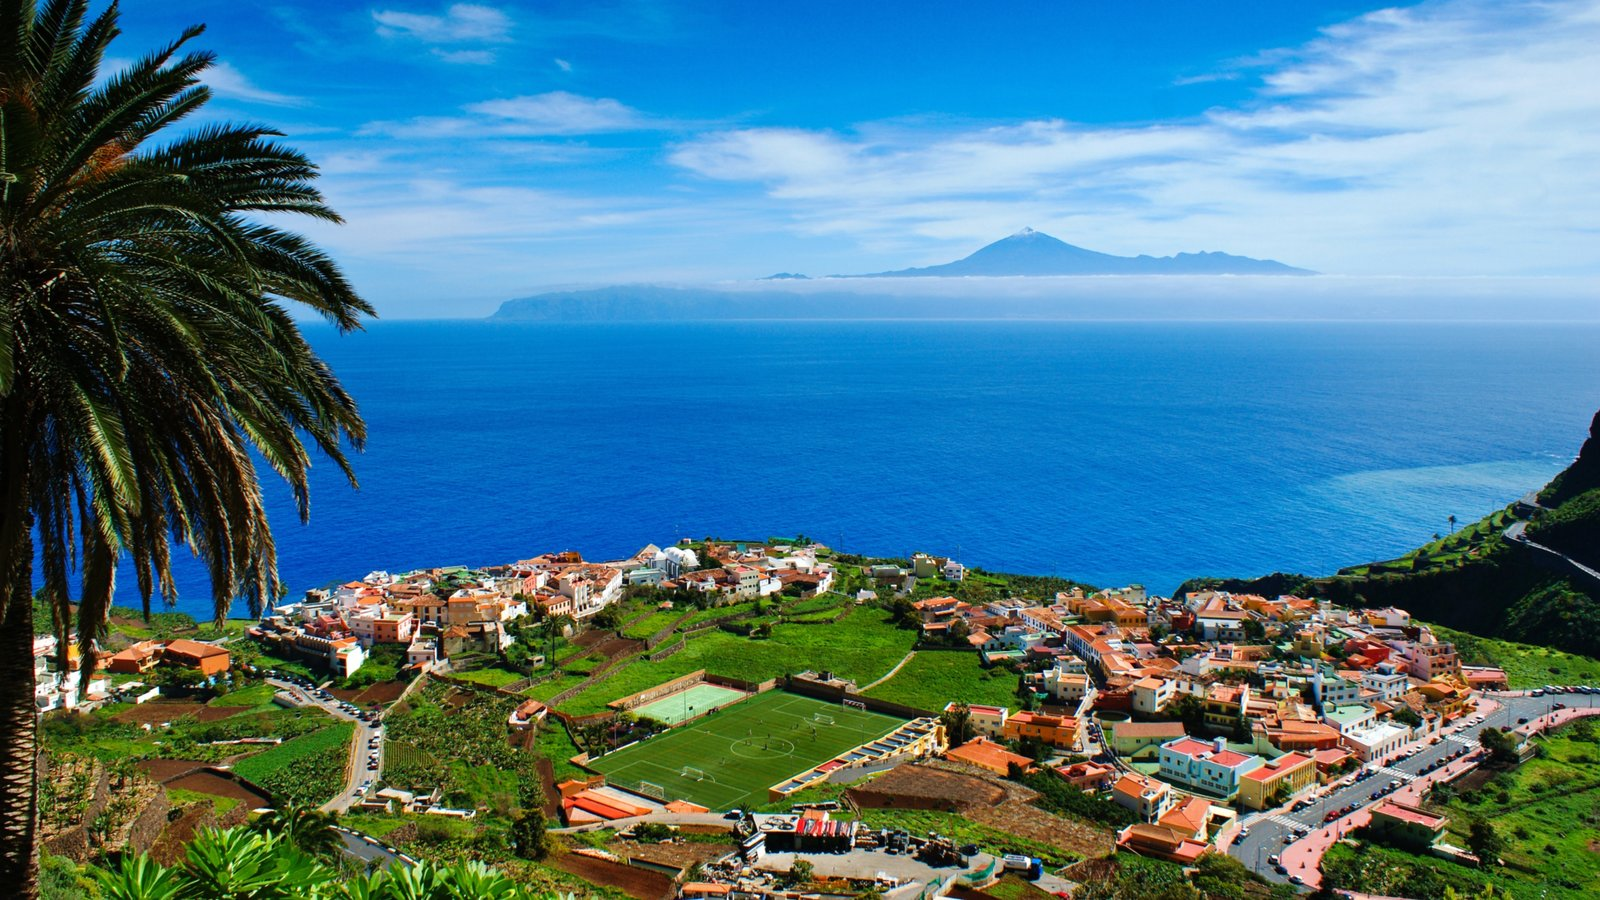 La Gomera which includes general coastal views and a coastal town